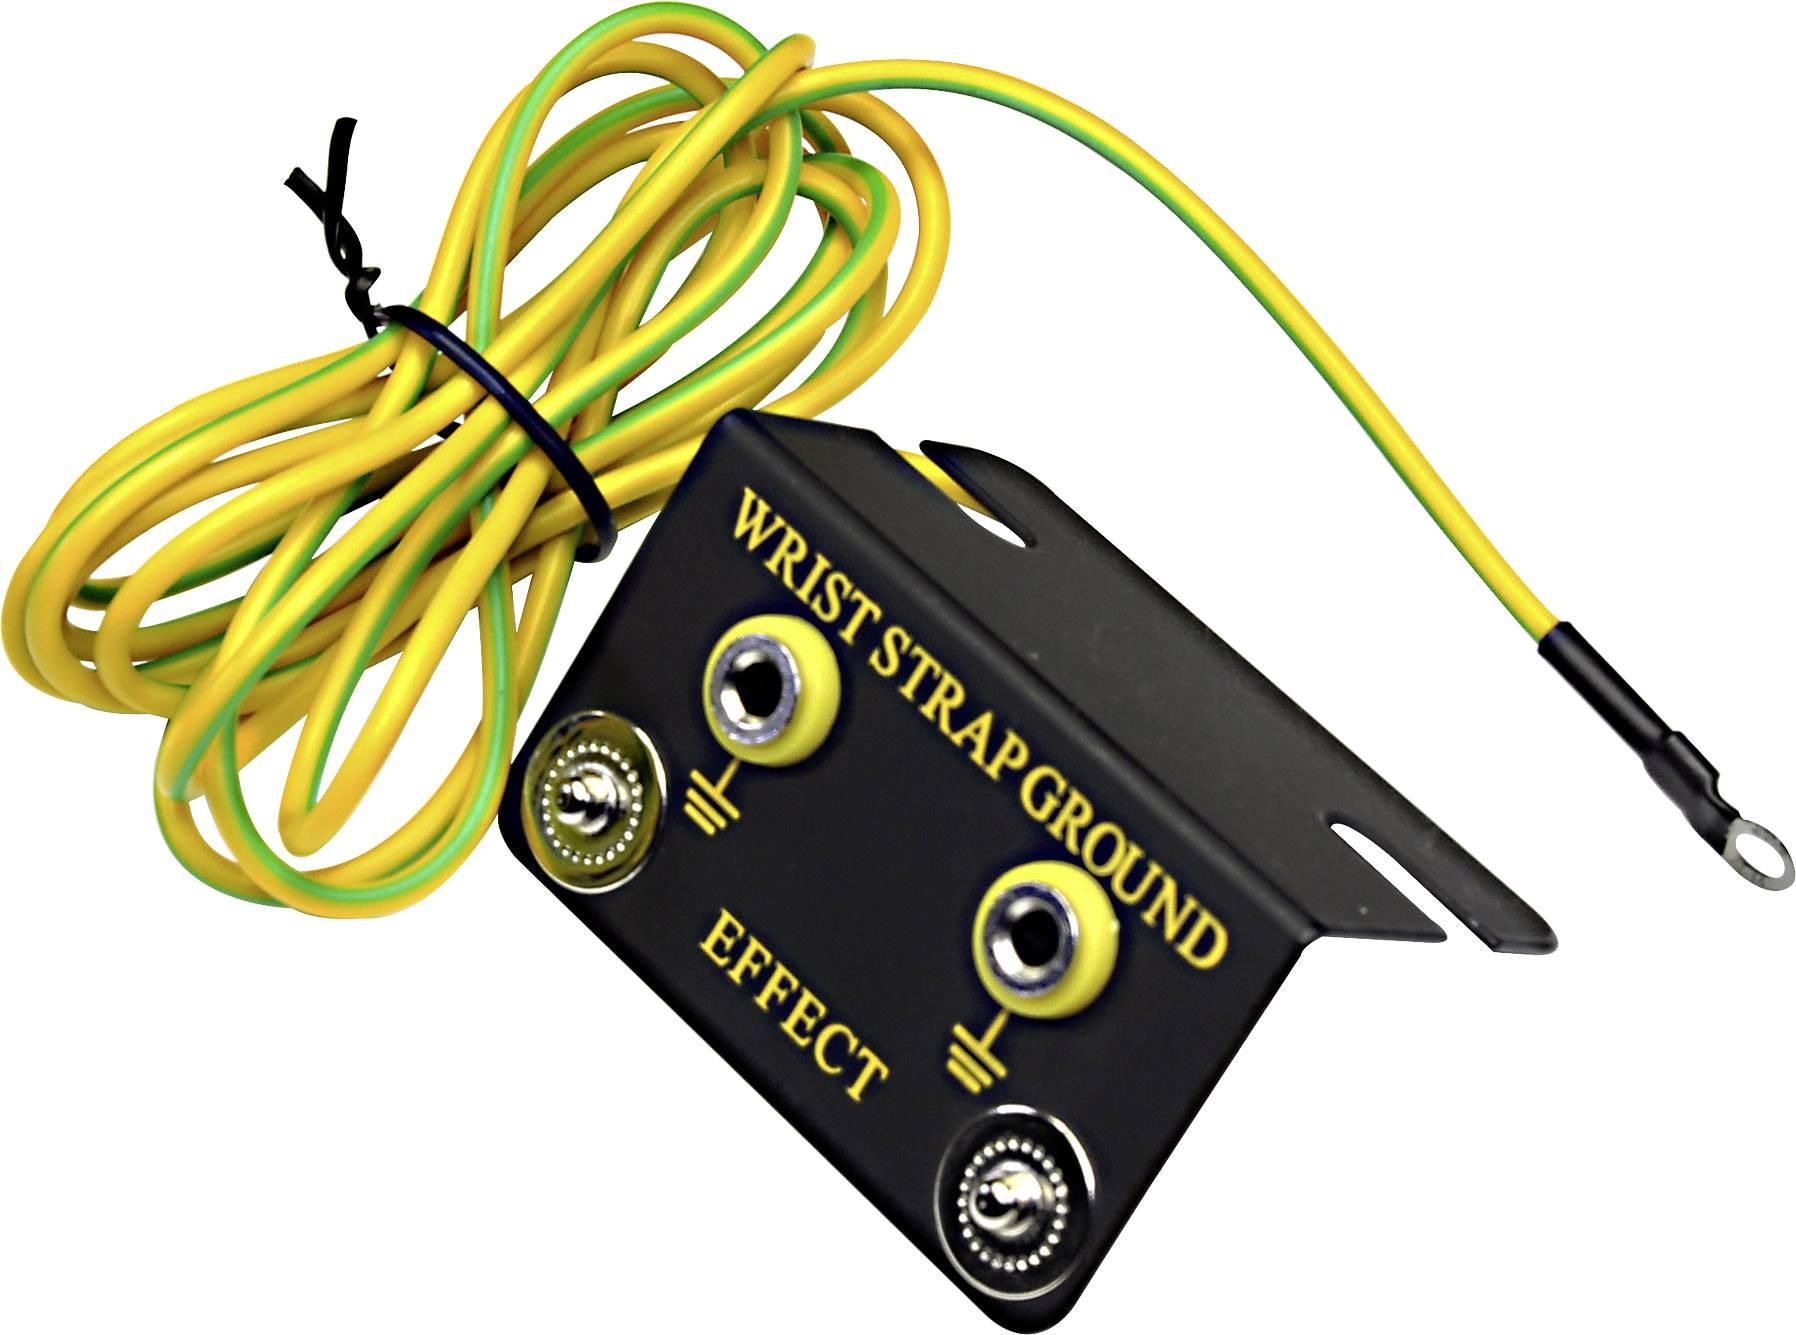 ESD uzemňovací box Conrad Components EBO-SETW-4-183-R, 1.83 m